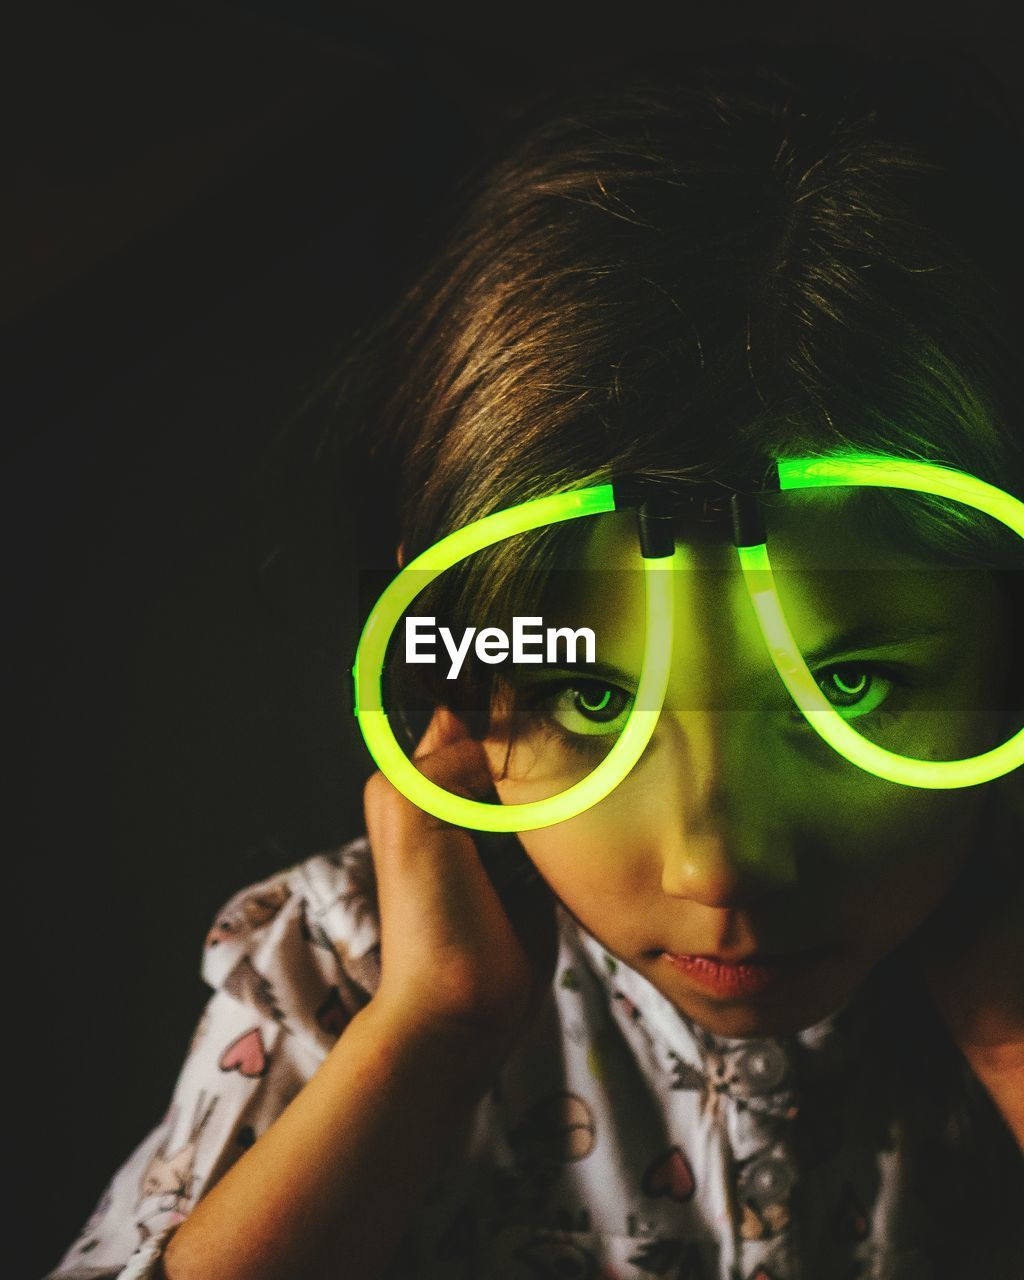 Close-Up Portrait Of Girl Wearing Illuminated Glasses